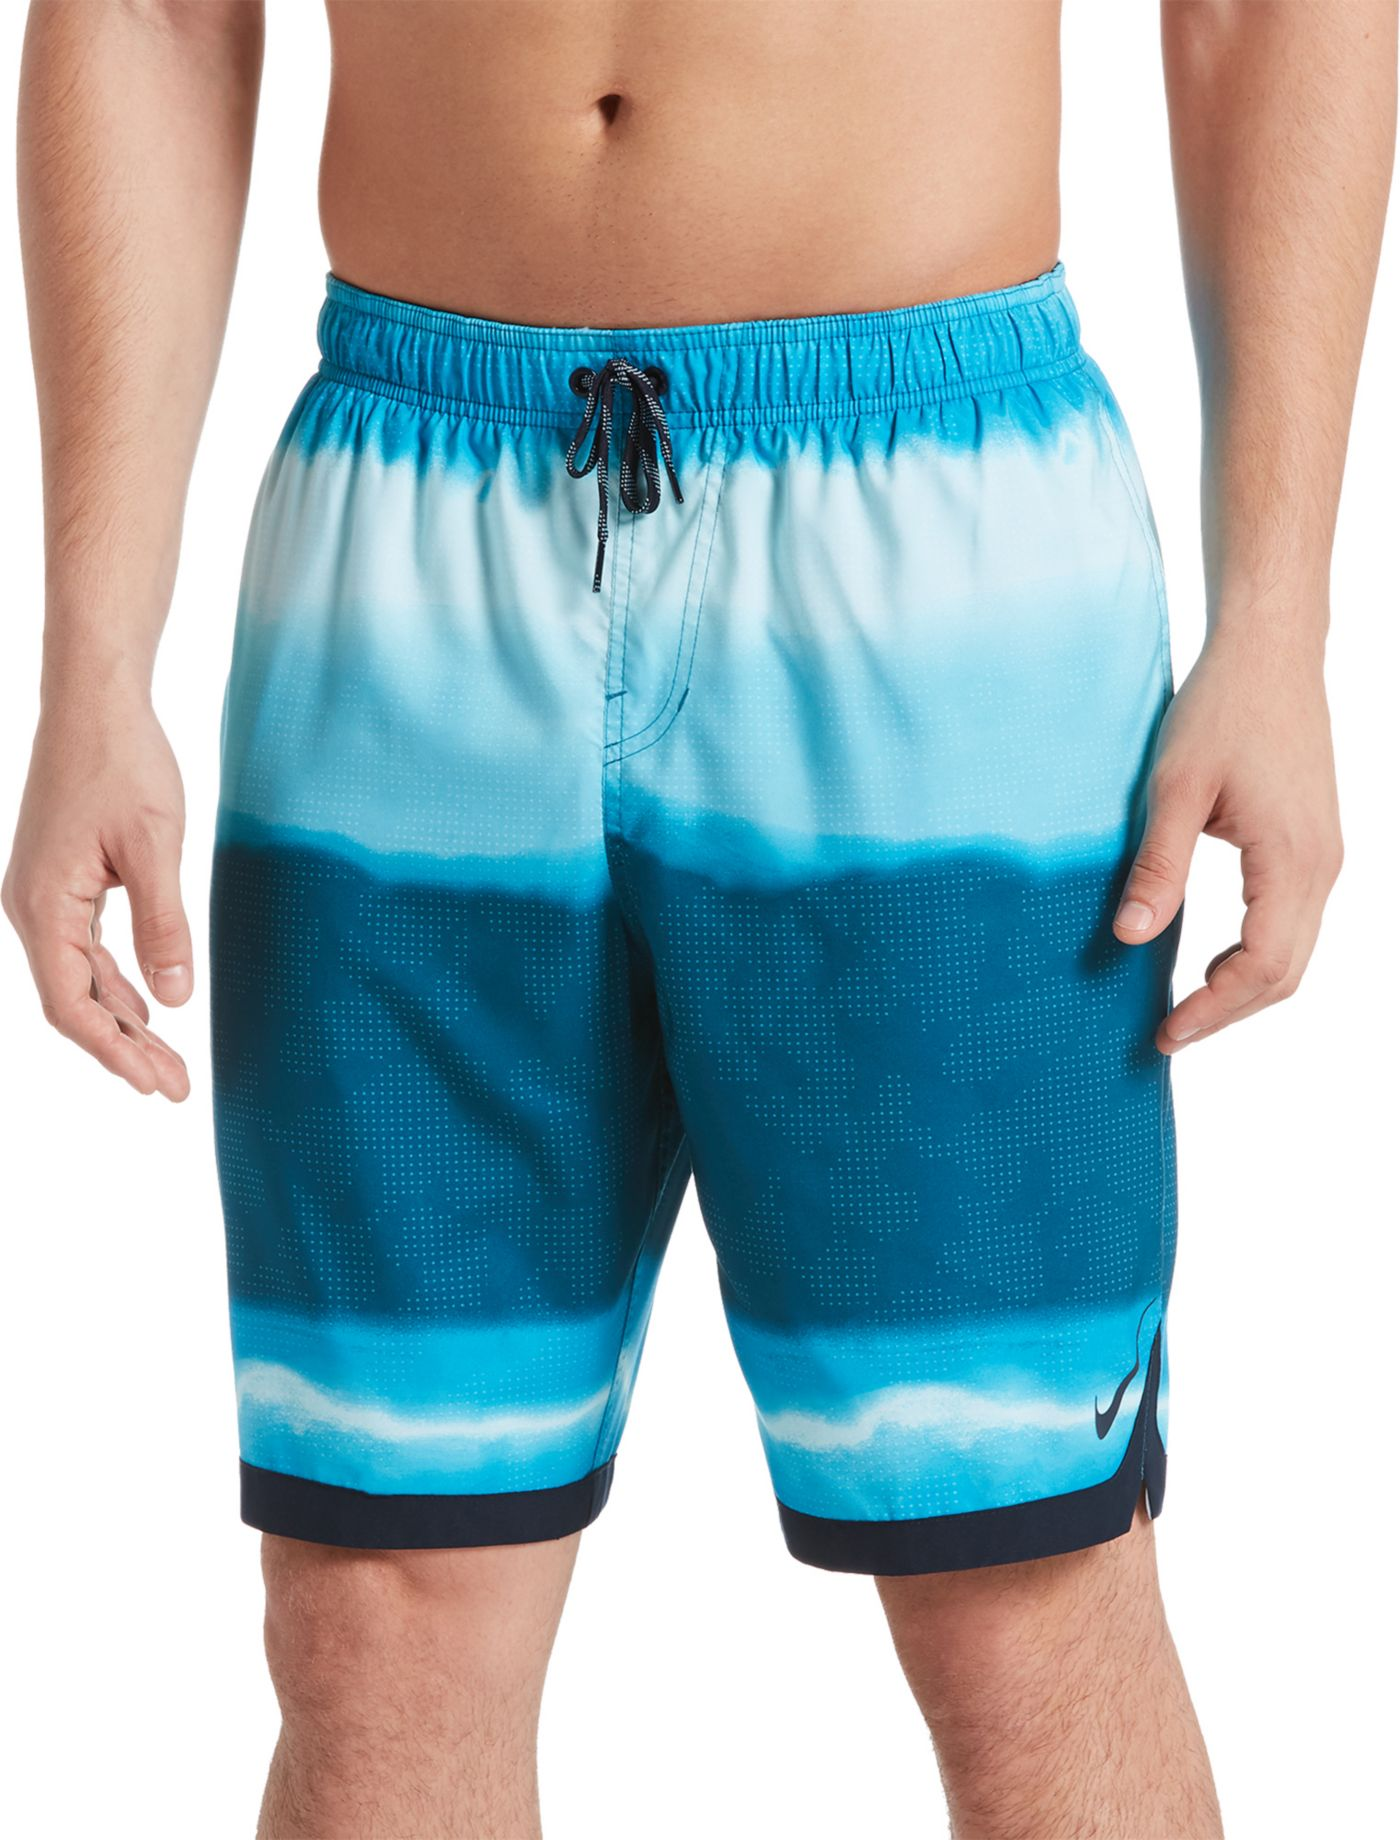 Nike Men's Optic Halo Horizon Swim Trunks